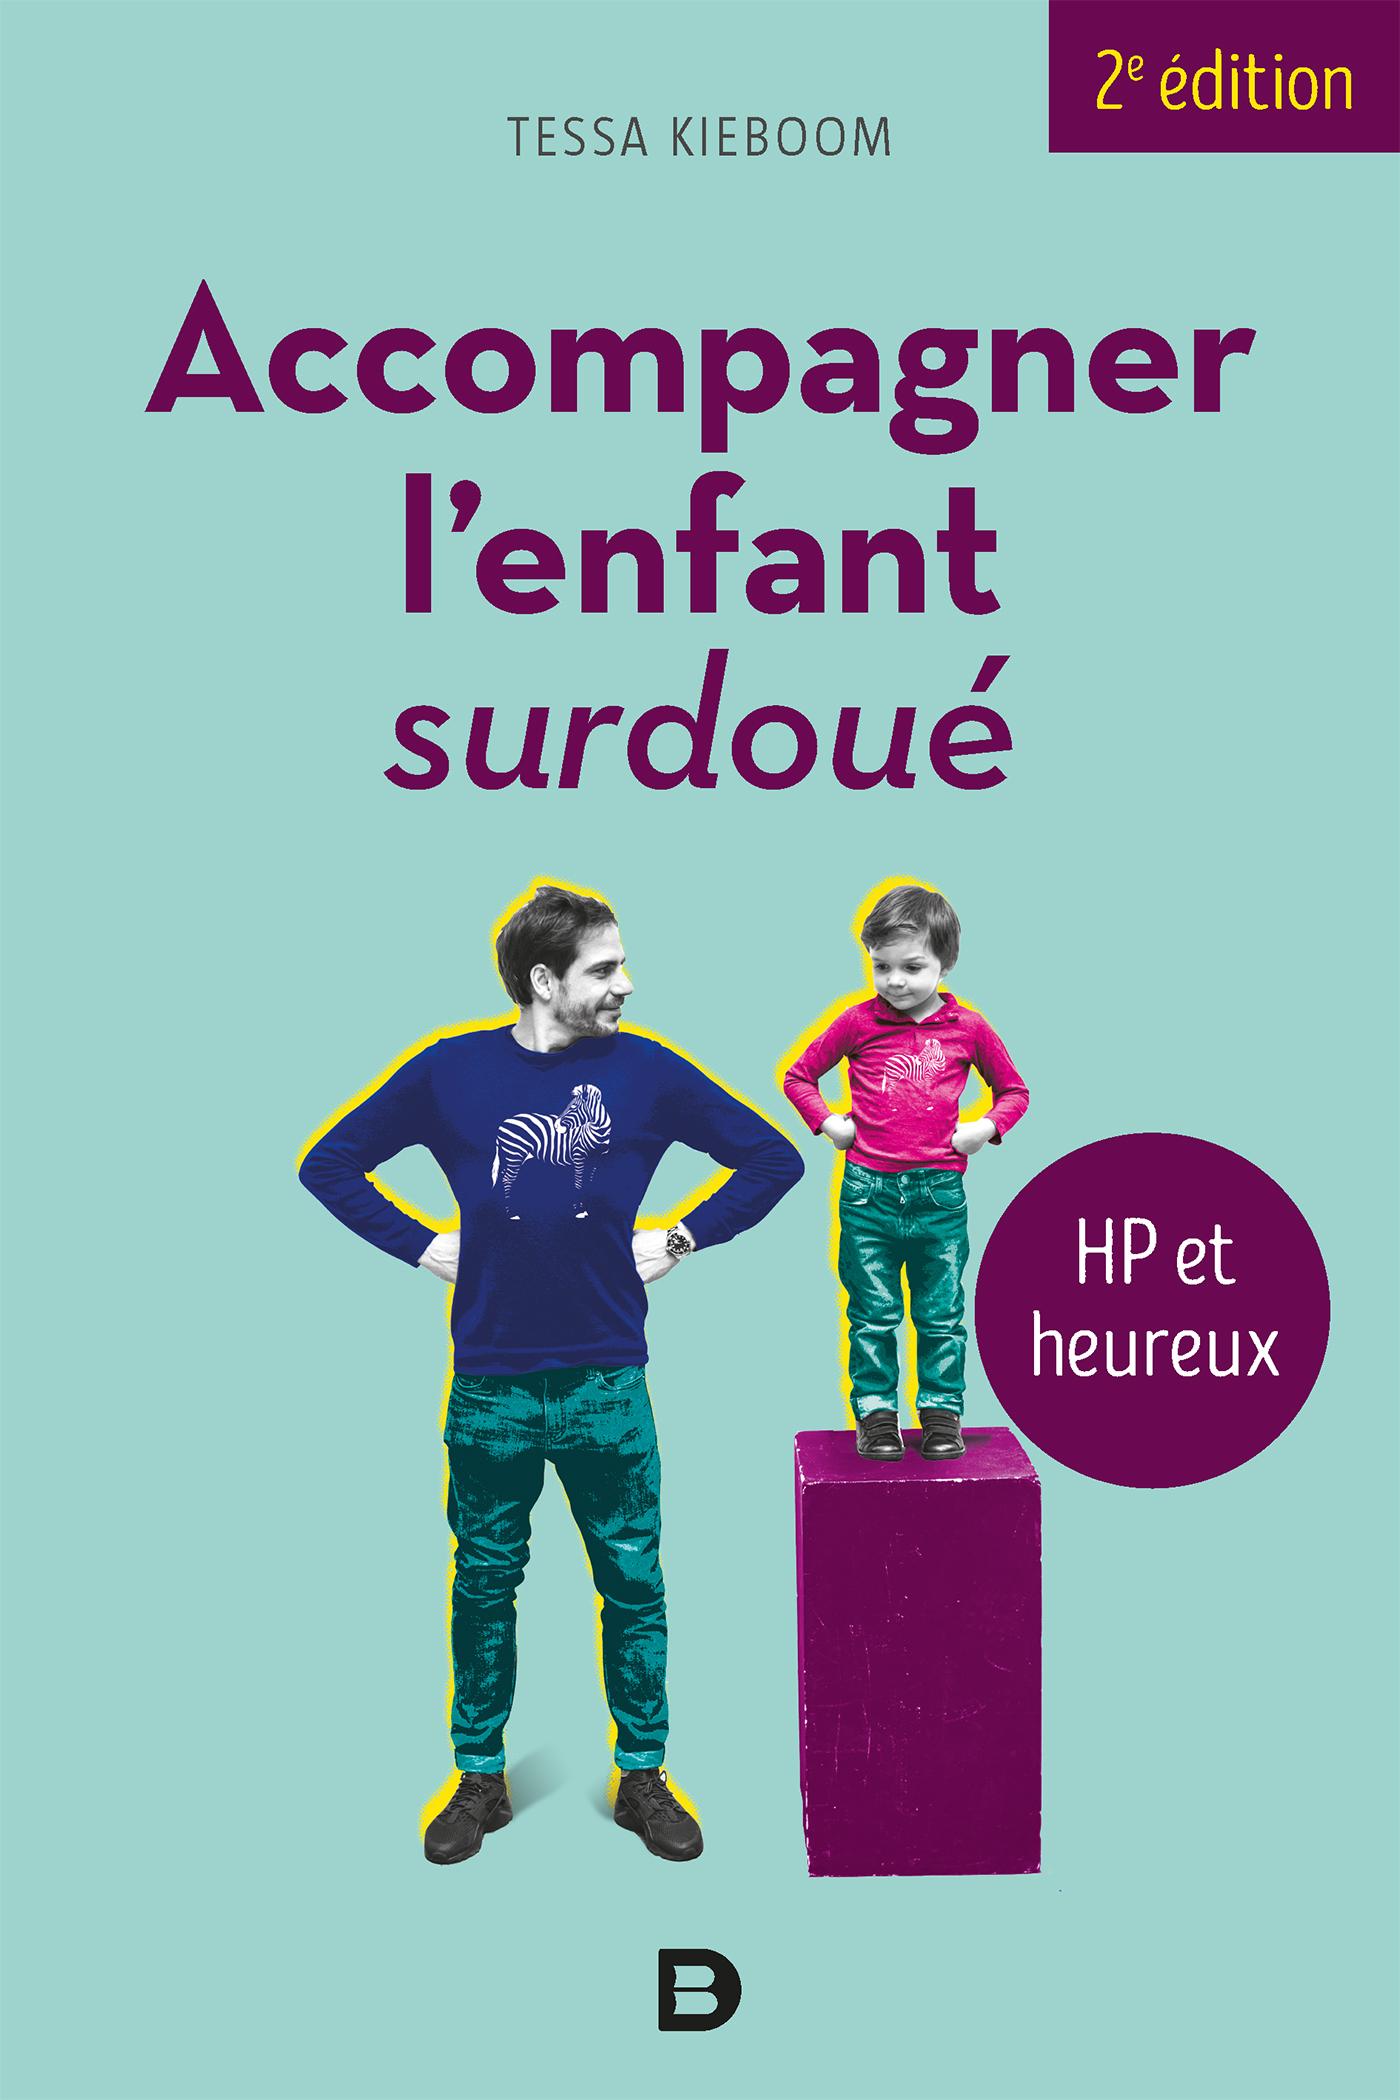 ACCOMPAGNER L'ENFANT SURDOUE